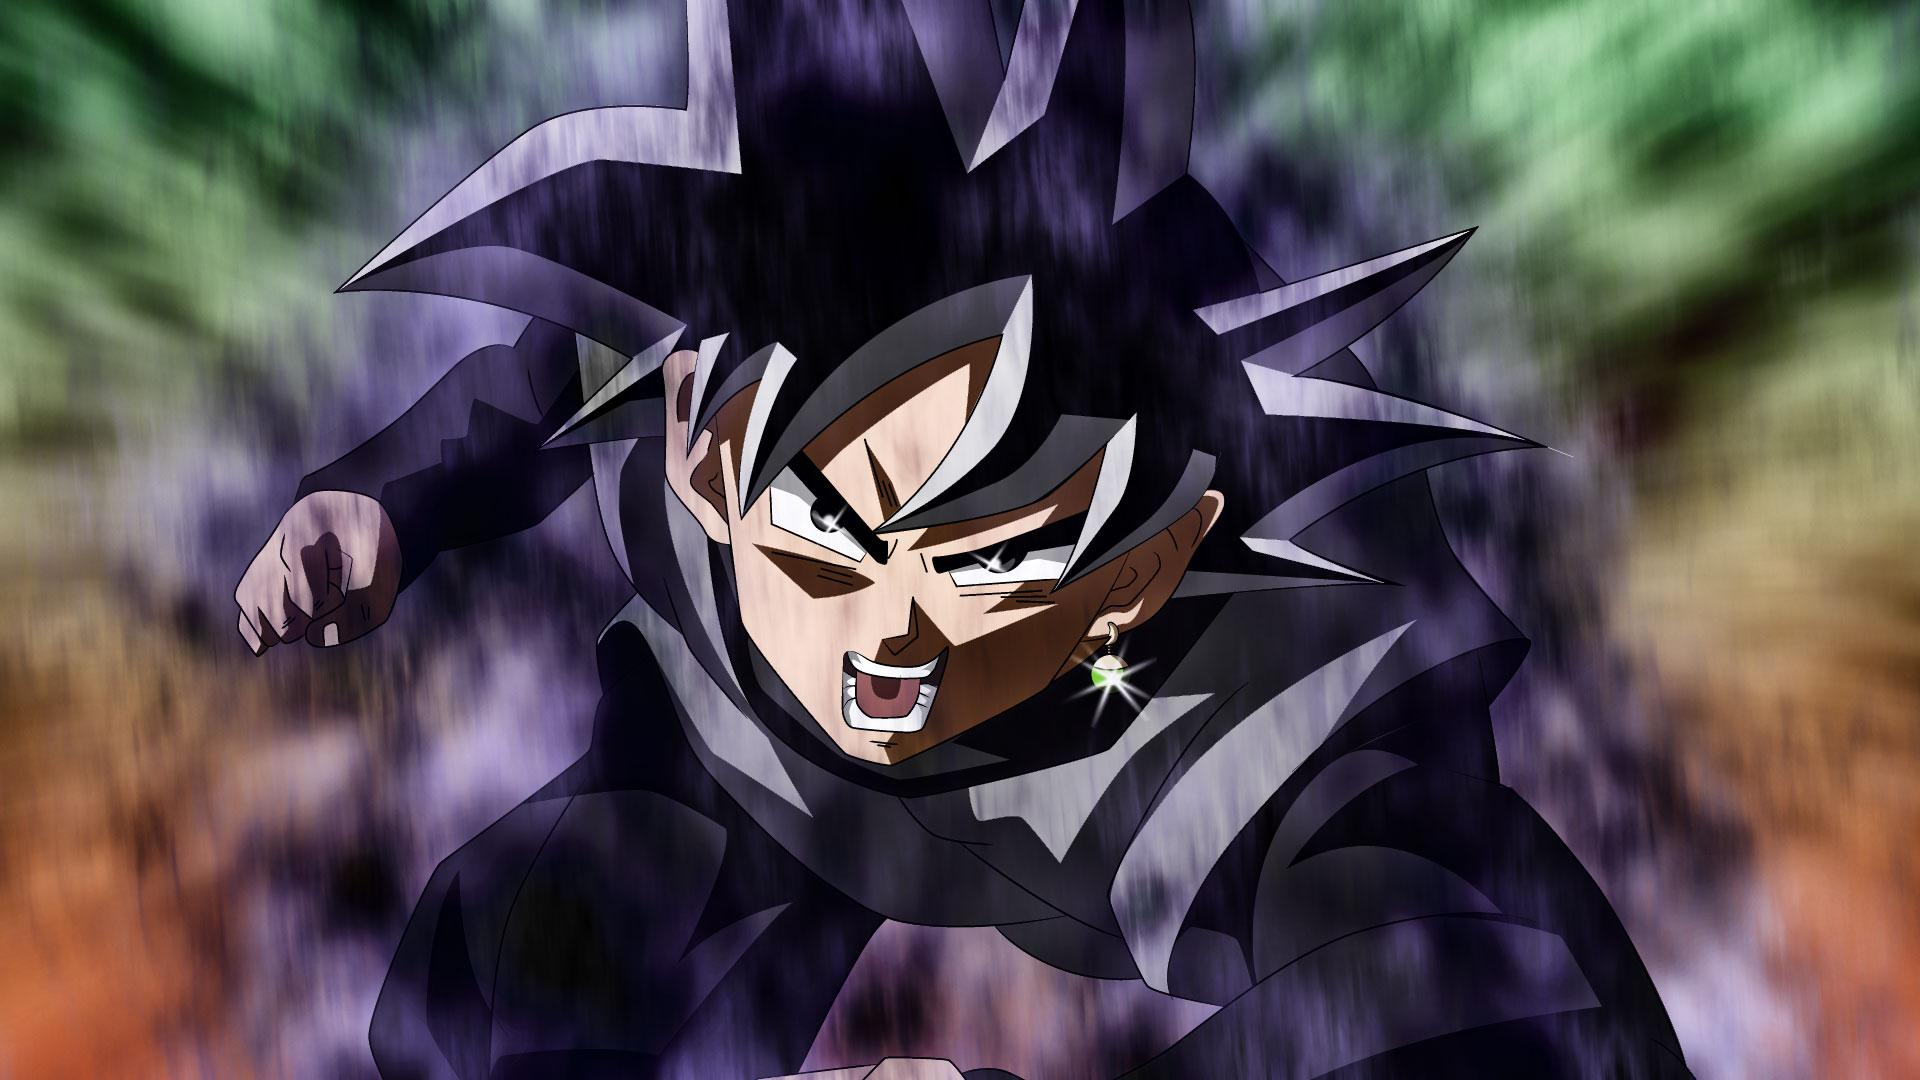 Goku Black #3 - PS4Wallpapers.com